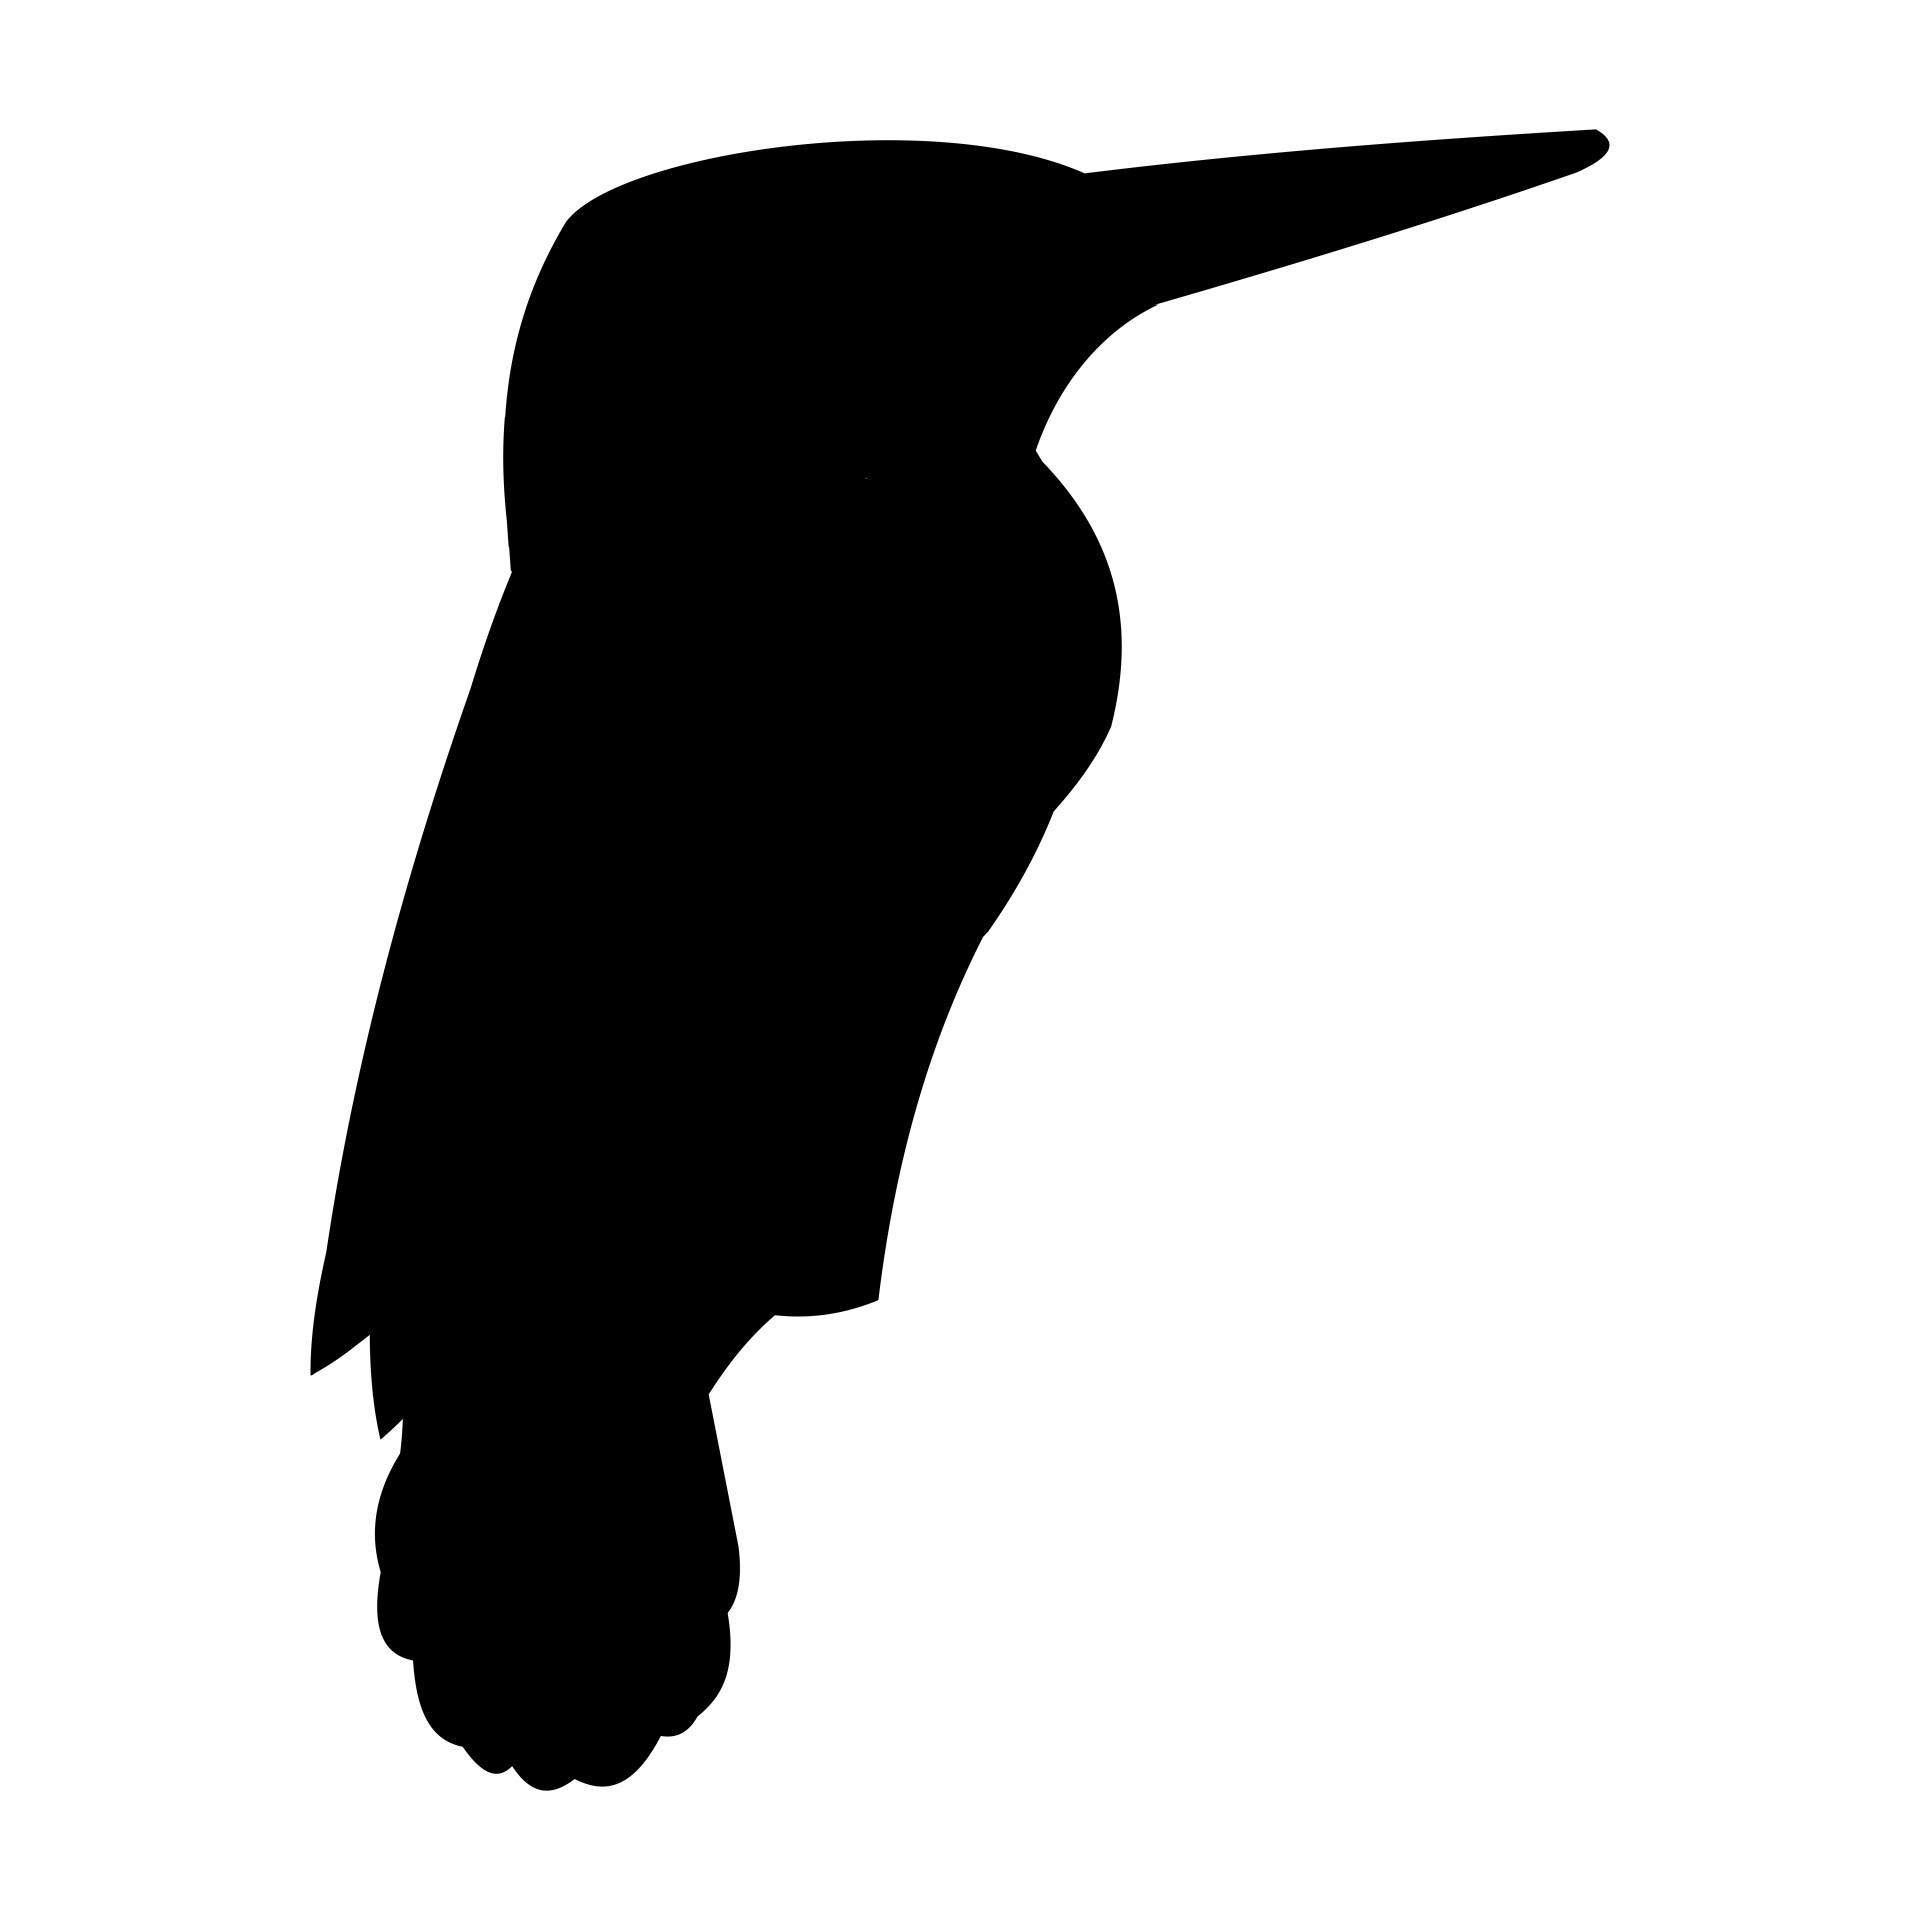 1920x1920 Kingfisher Free Stock Photo